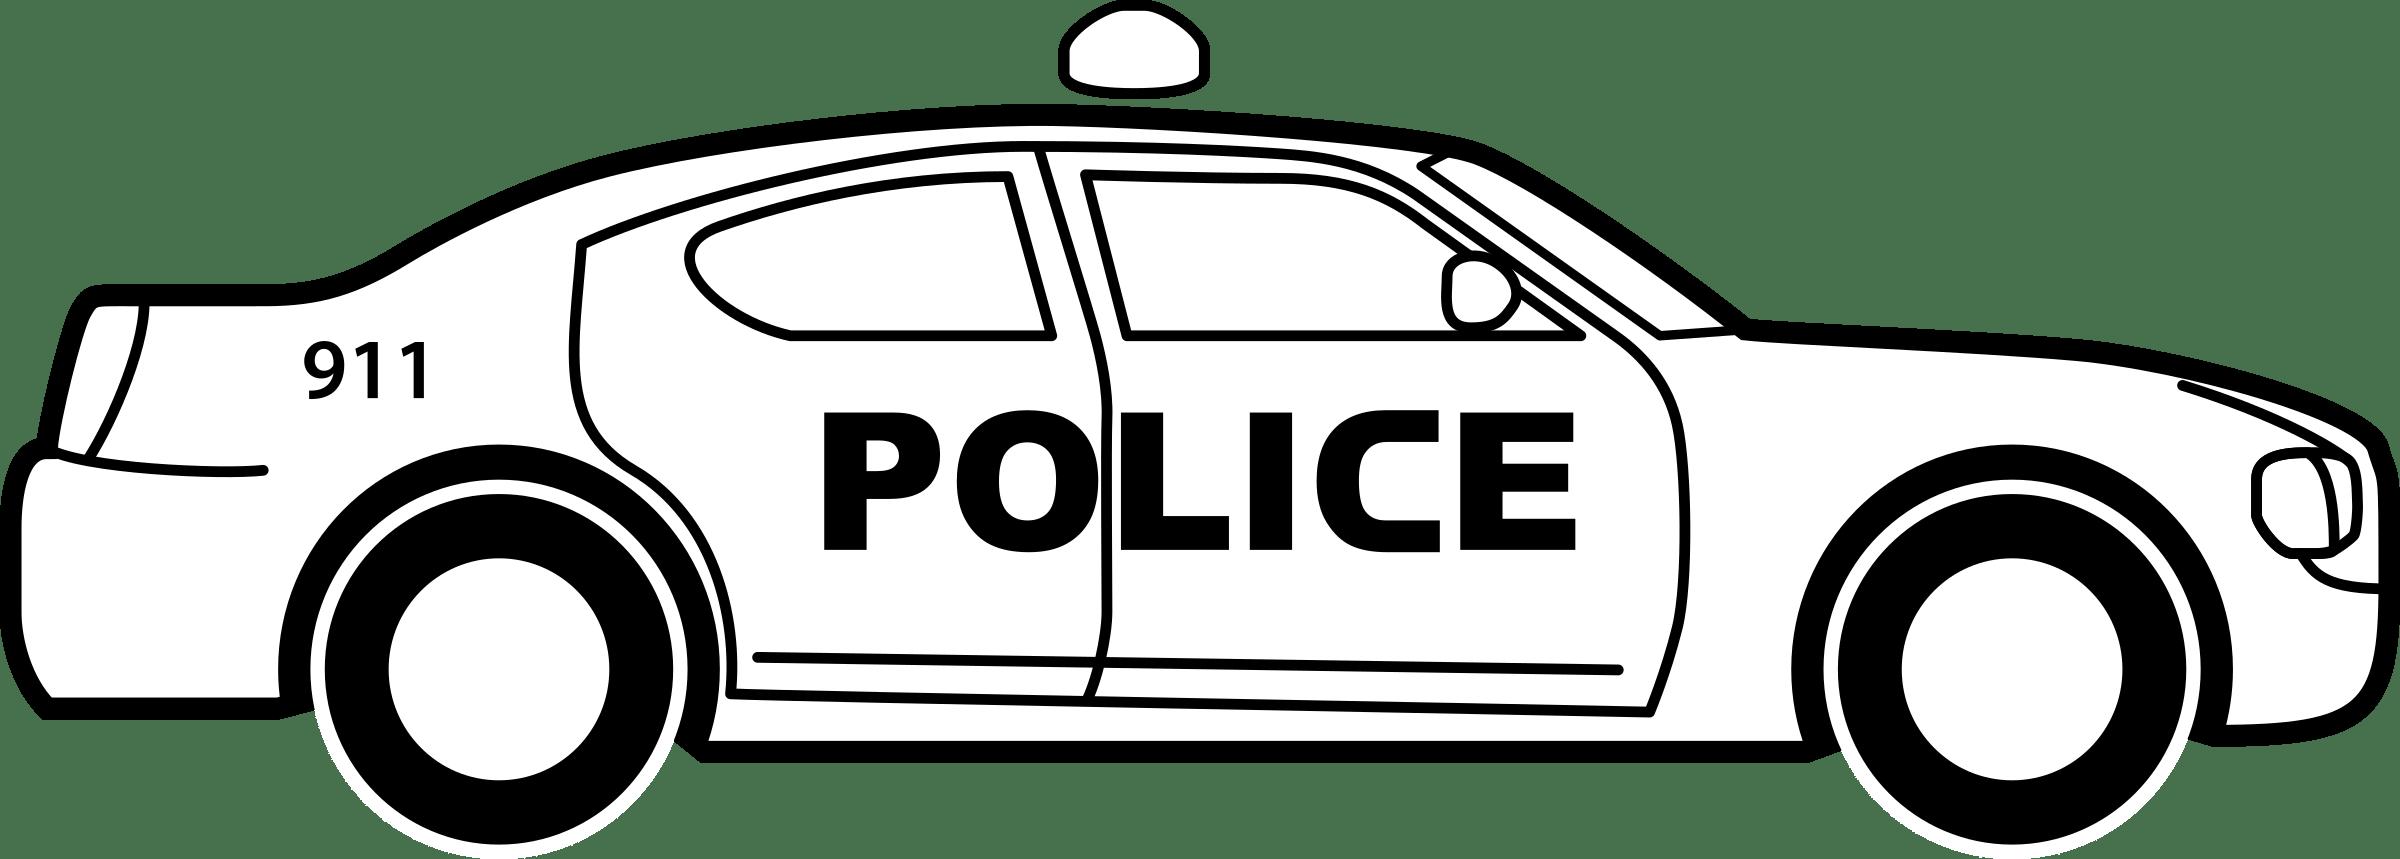 Criminal Clipart Car Criminal Car Transparent Free For